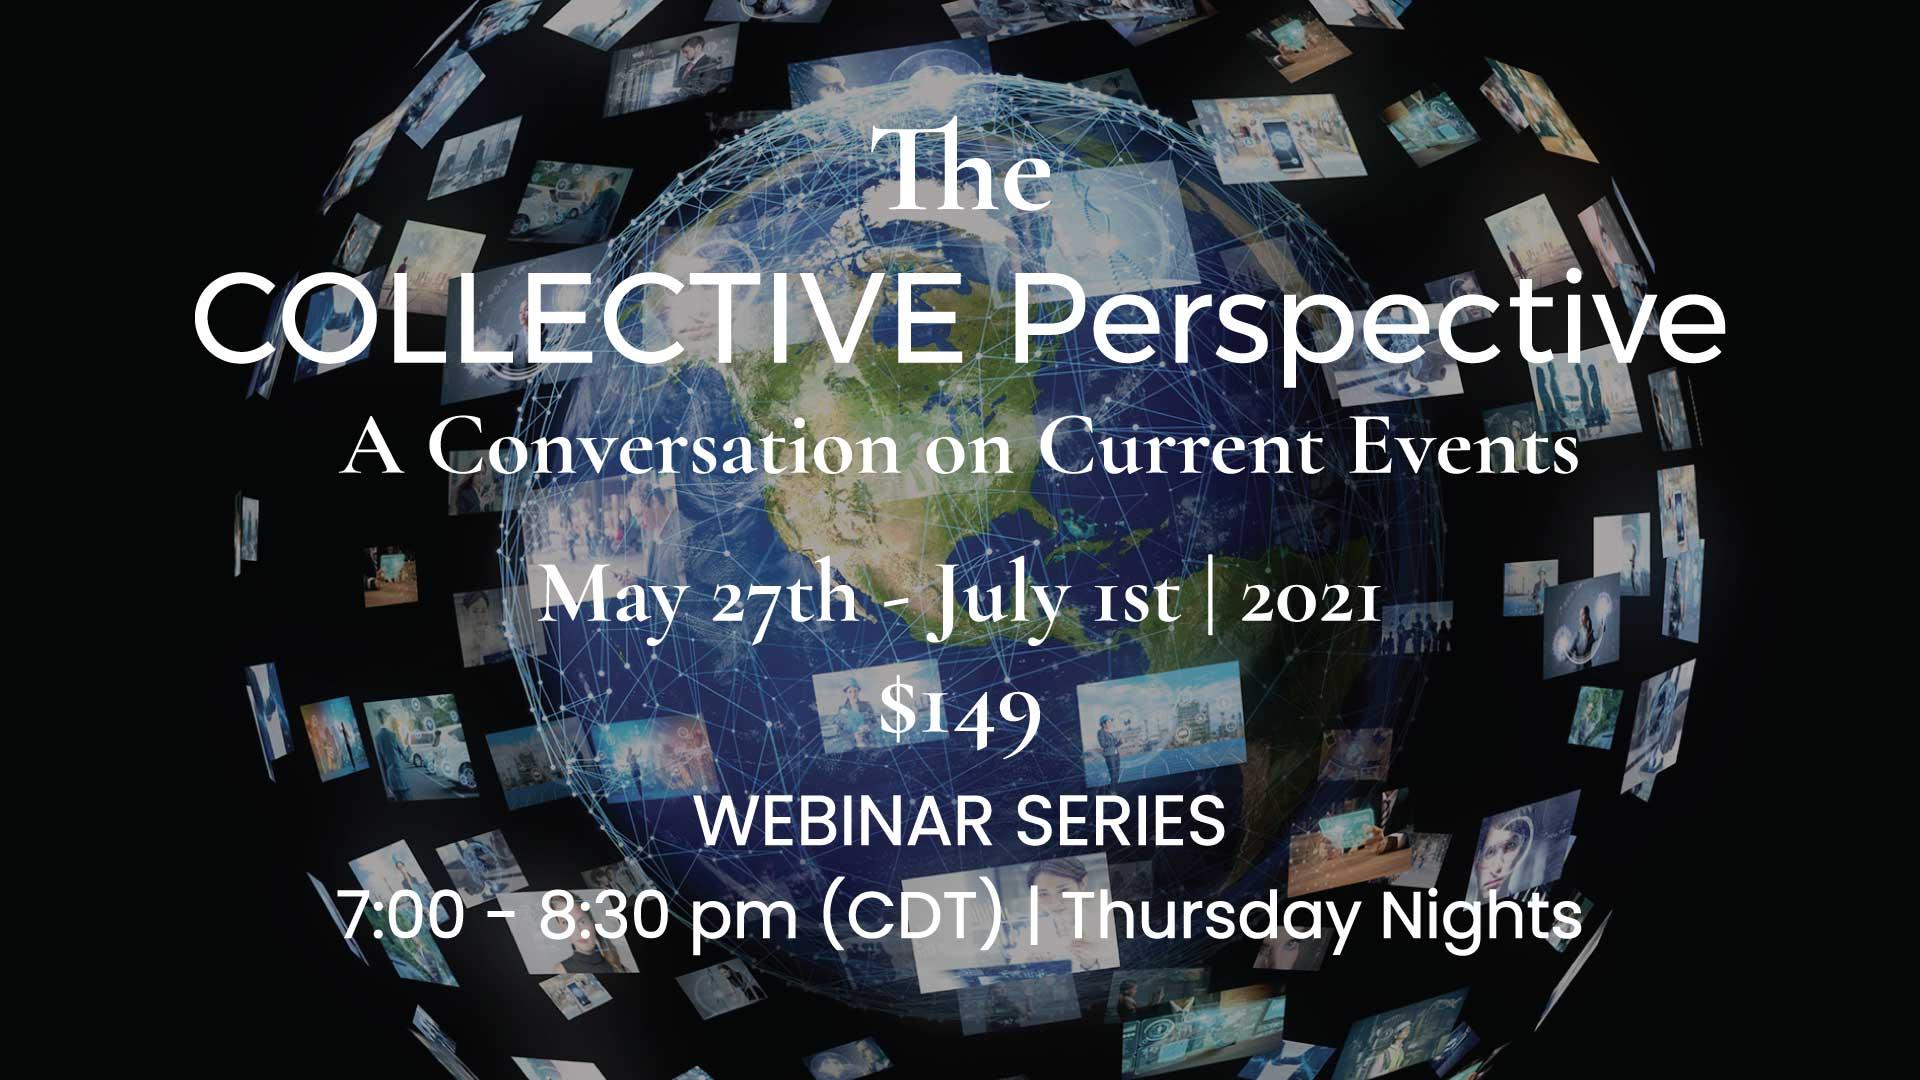 Collective Perspective Webinar Series